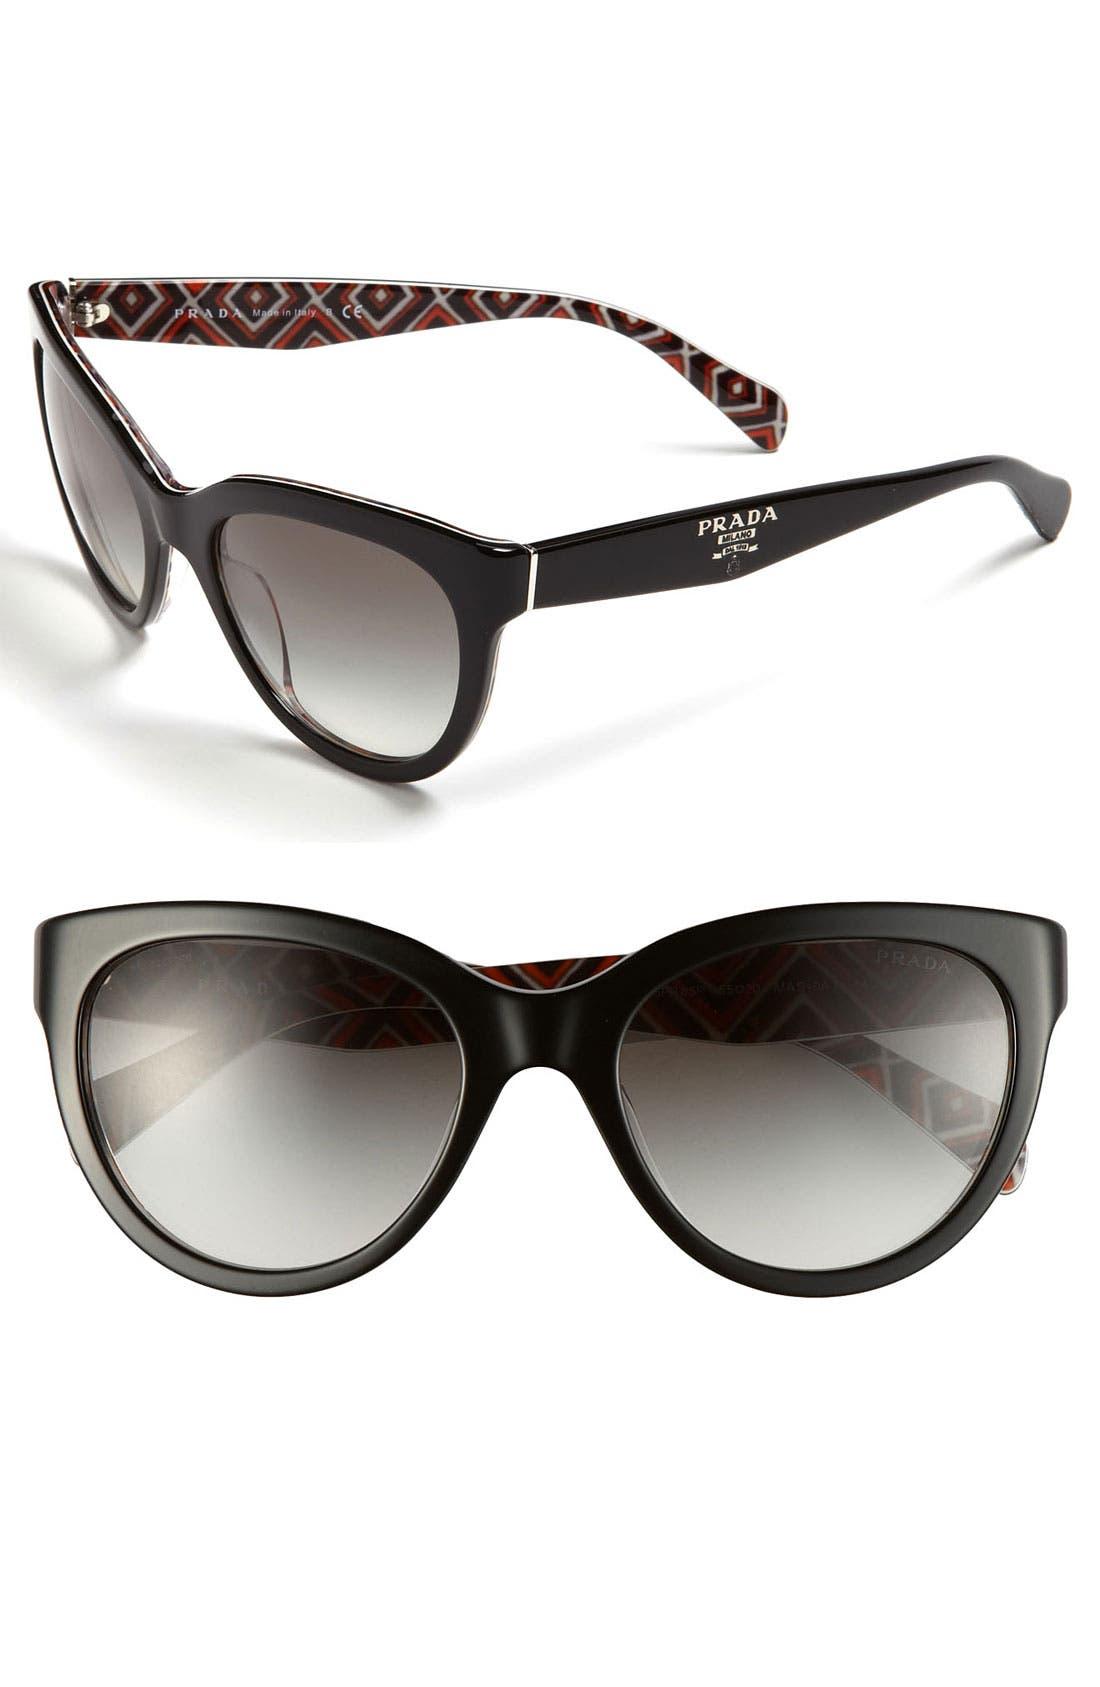 Main Image - Prada 'Timeless Phantos' 55mm Sunglasses